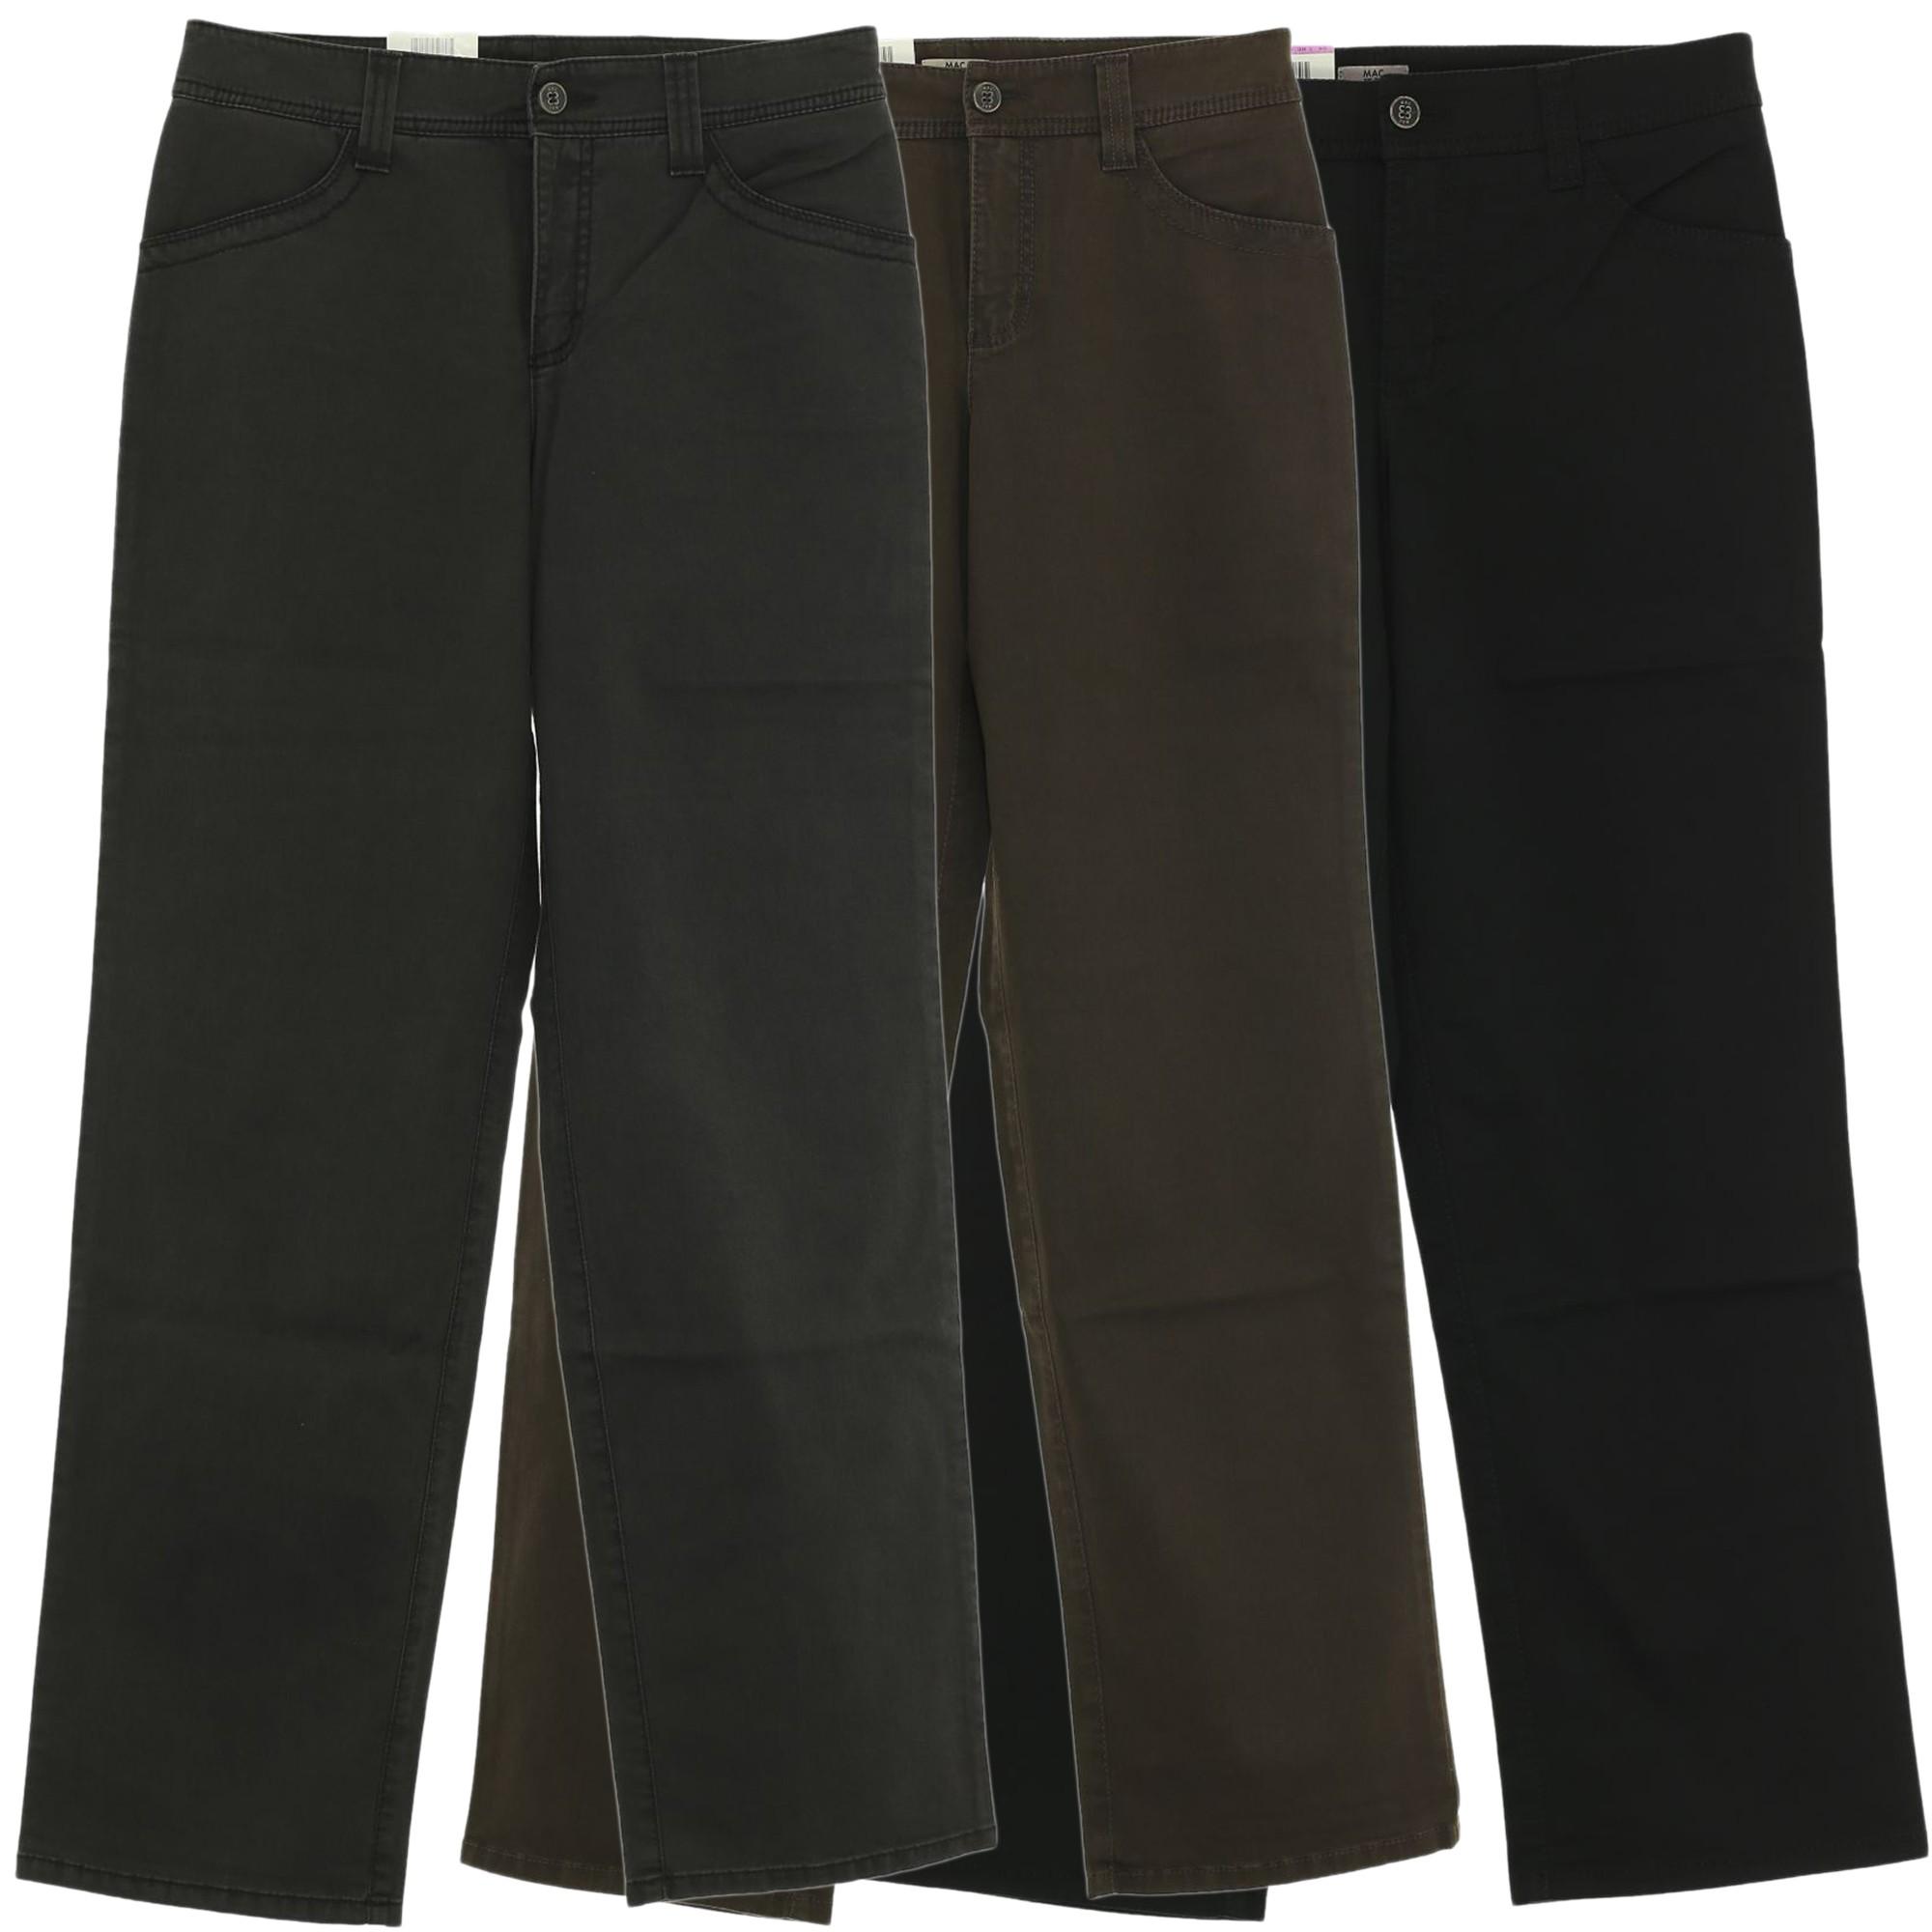 mac jeans gracia new damen stretch feminine fit ebay. Black Bedroom Furniture Sets. Home Design Ideas